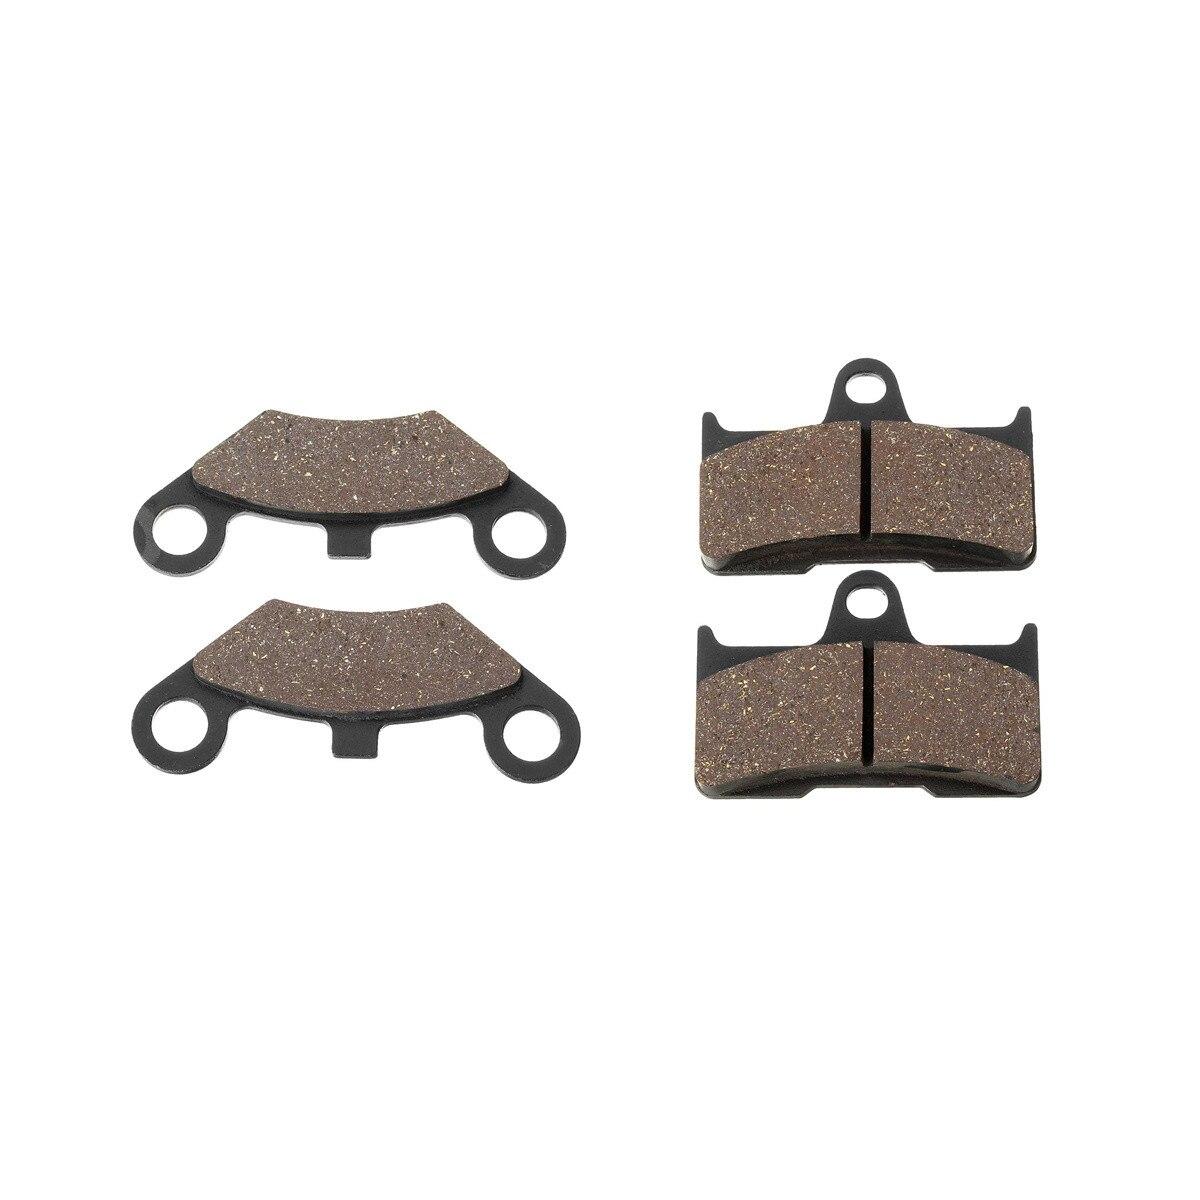 1 Set 4PCS Front & Rear Brake Pad For Yamaha /Shineary/CF/Moto /CFMoto /CF500 500 500CC CF600 600 600CC X5 X6 X8 U5 ATV UTV футболка quiksilver checker pasts tees flint stone